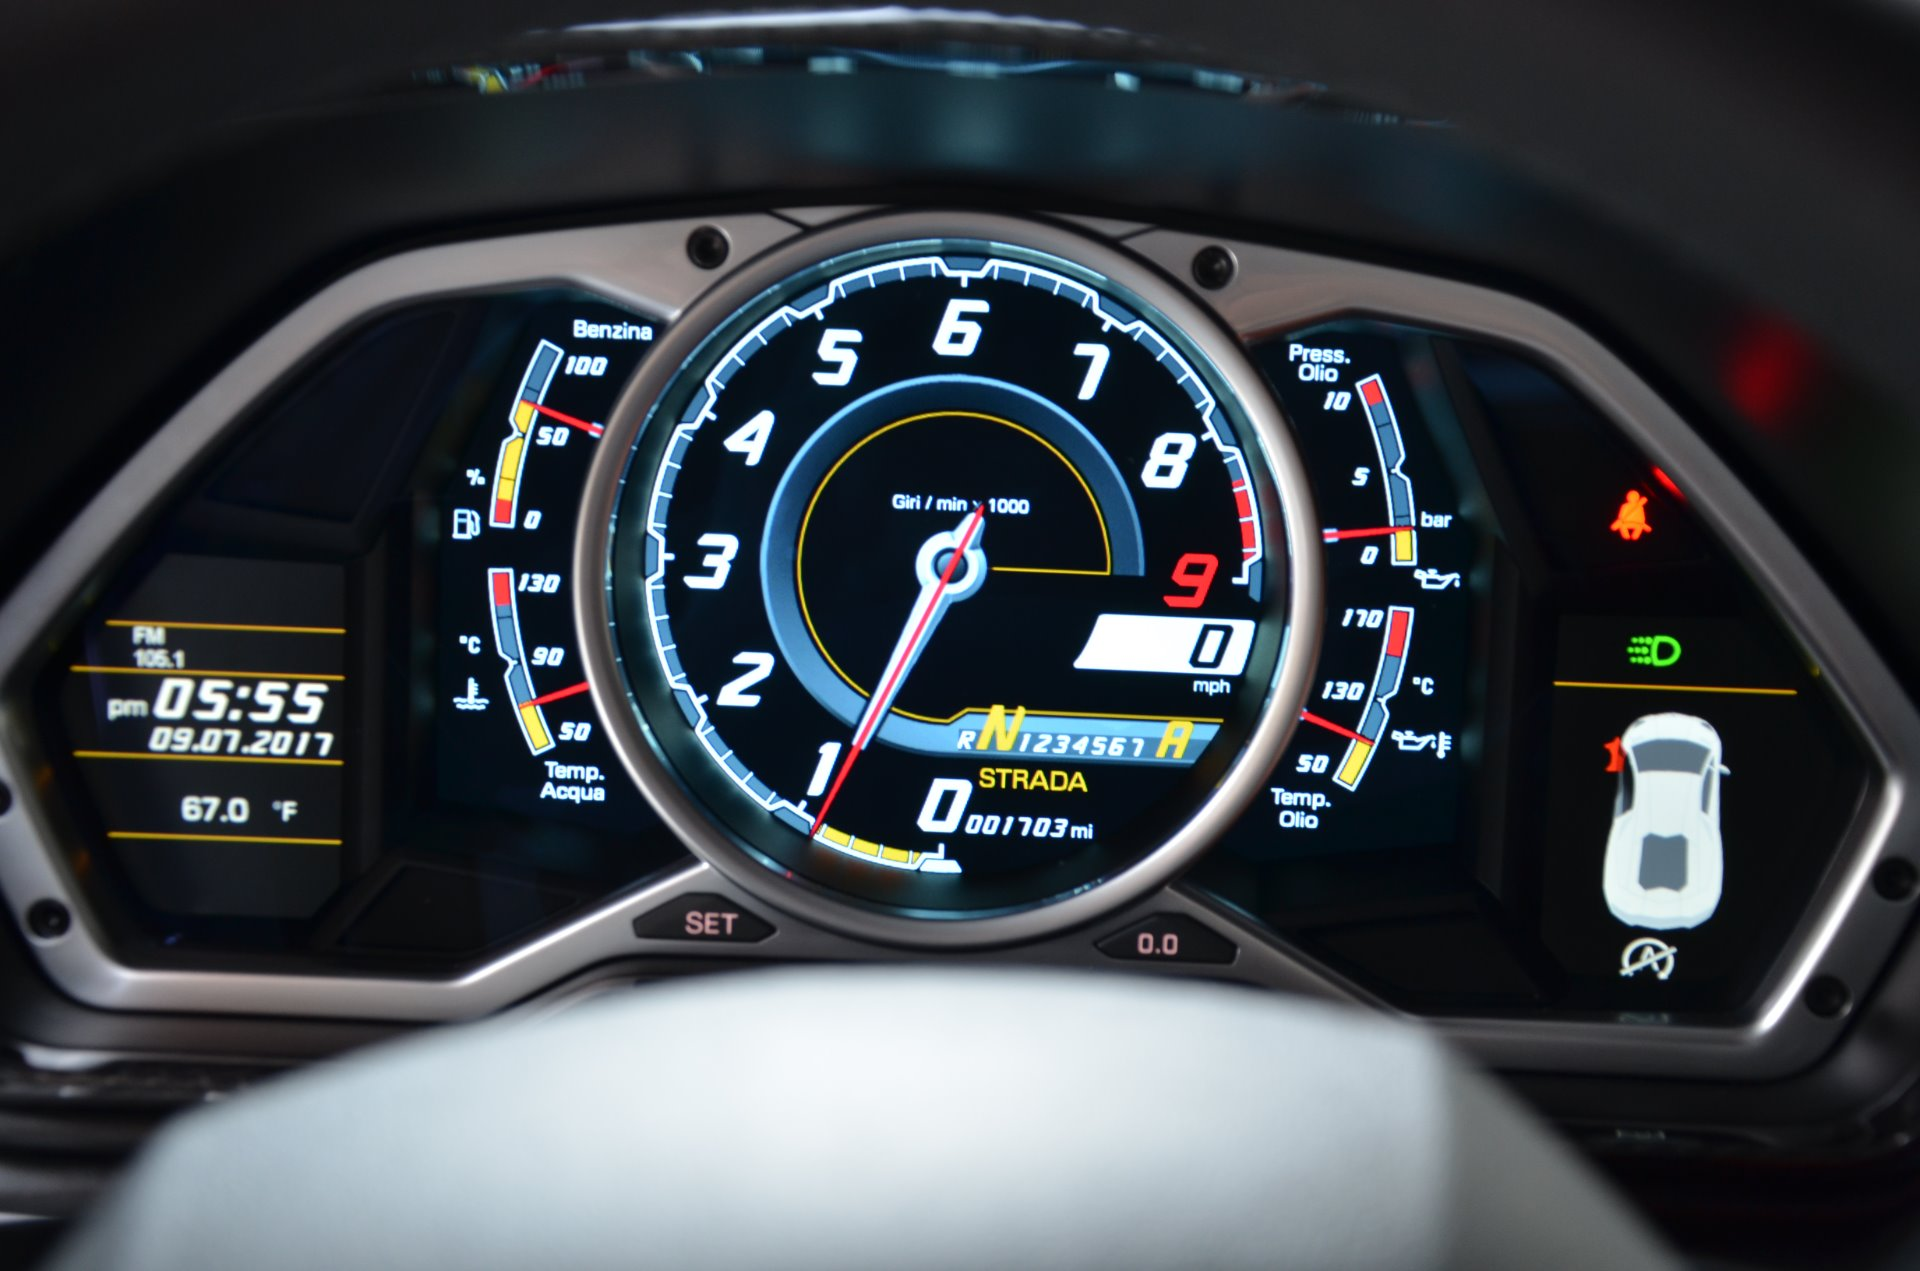 2017 Lamborghini Aventador Miura Lp 700 4 Stock Gc2202 For Sale